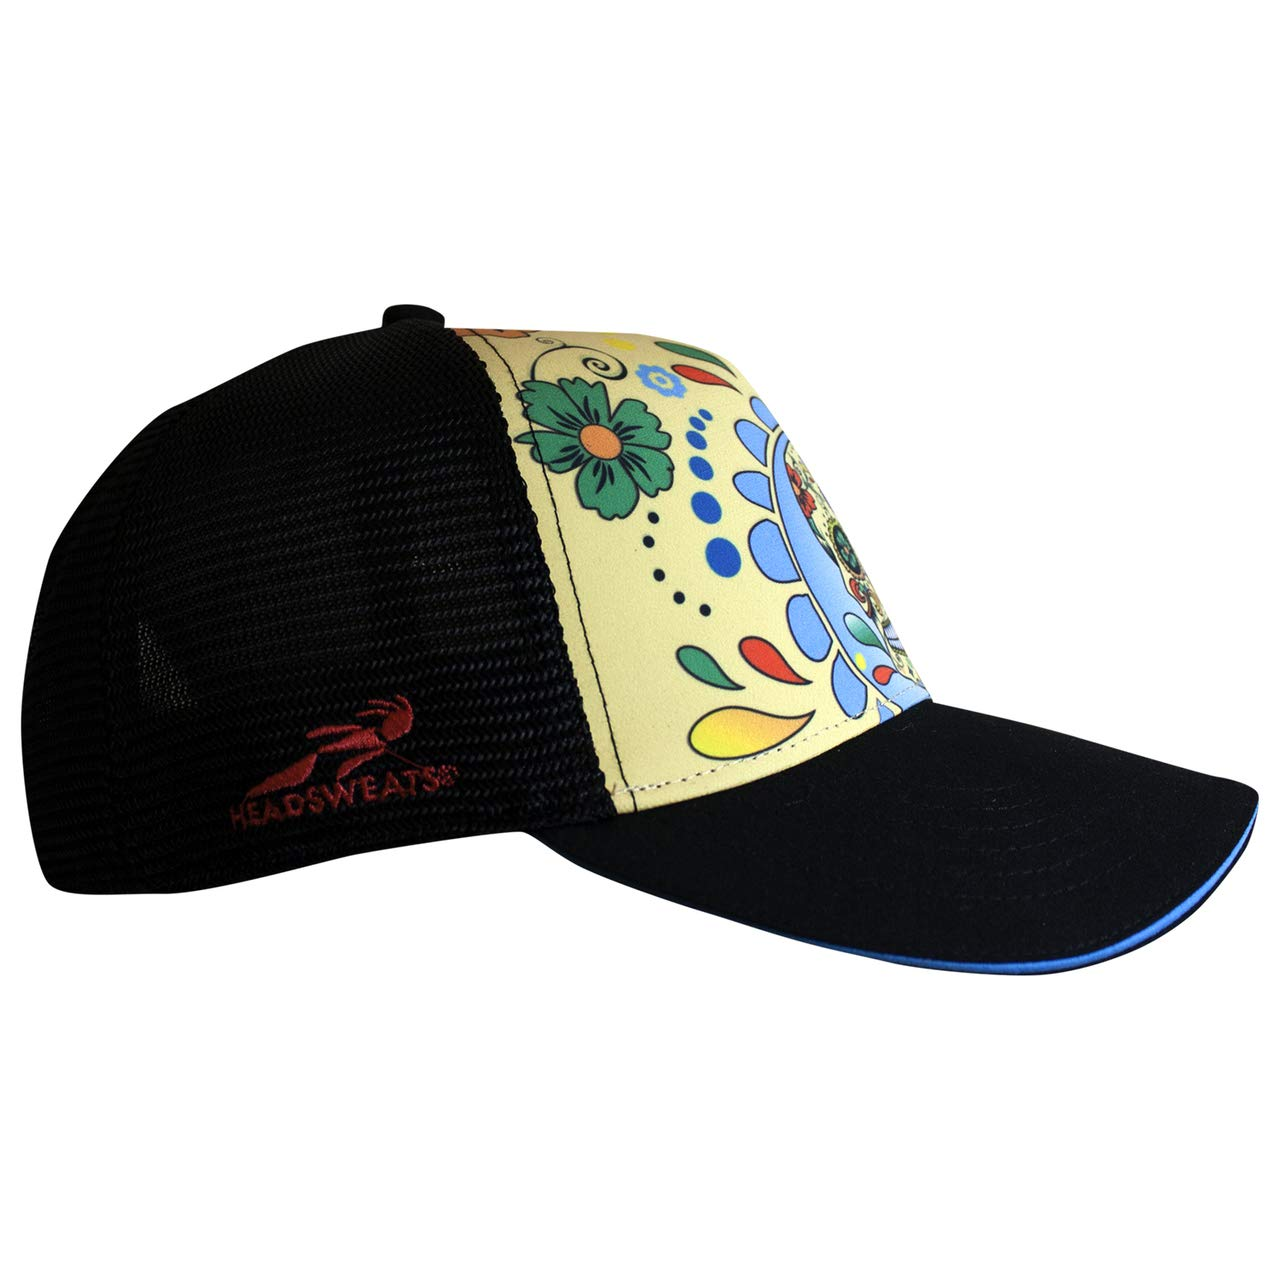 9b4f5c8a3e7 Amazon.com  Headsweats Performance Trucker Hat